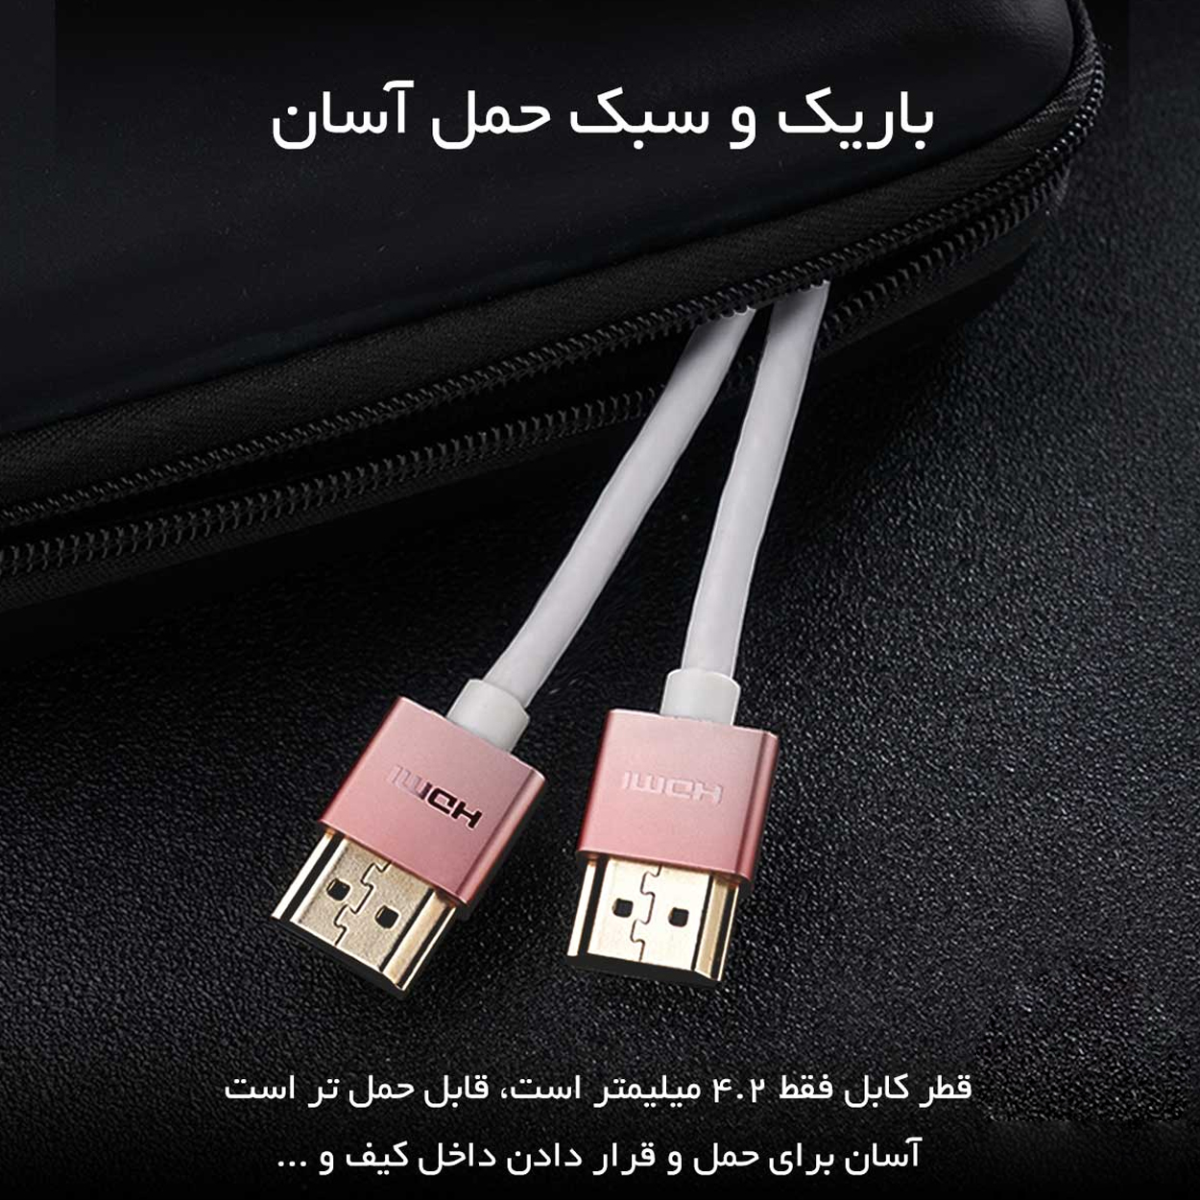 ایران شاپ  Image of Untitled 1 1